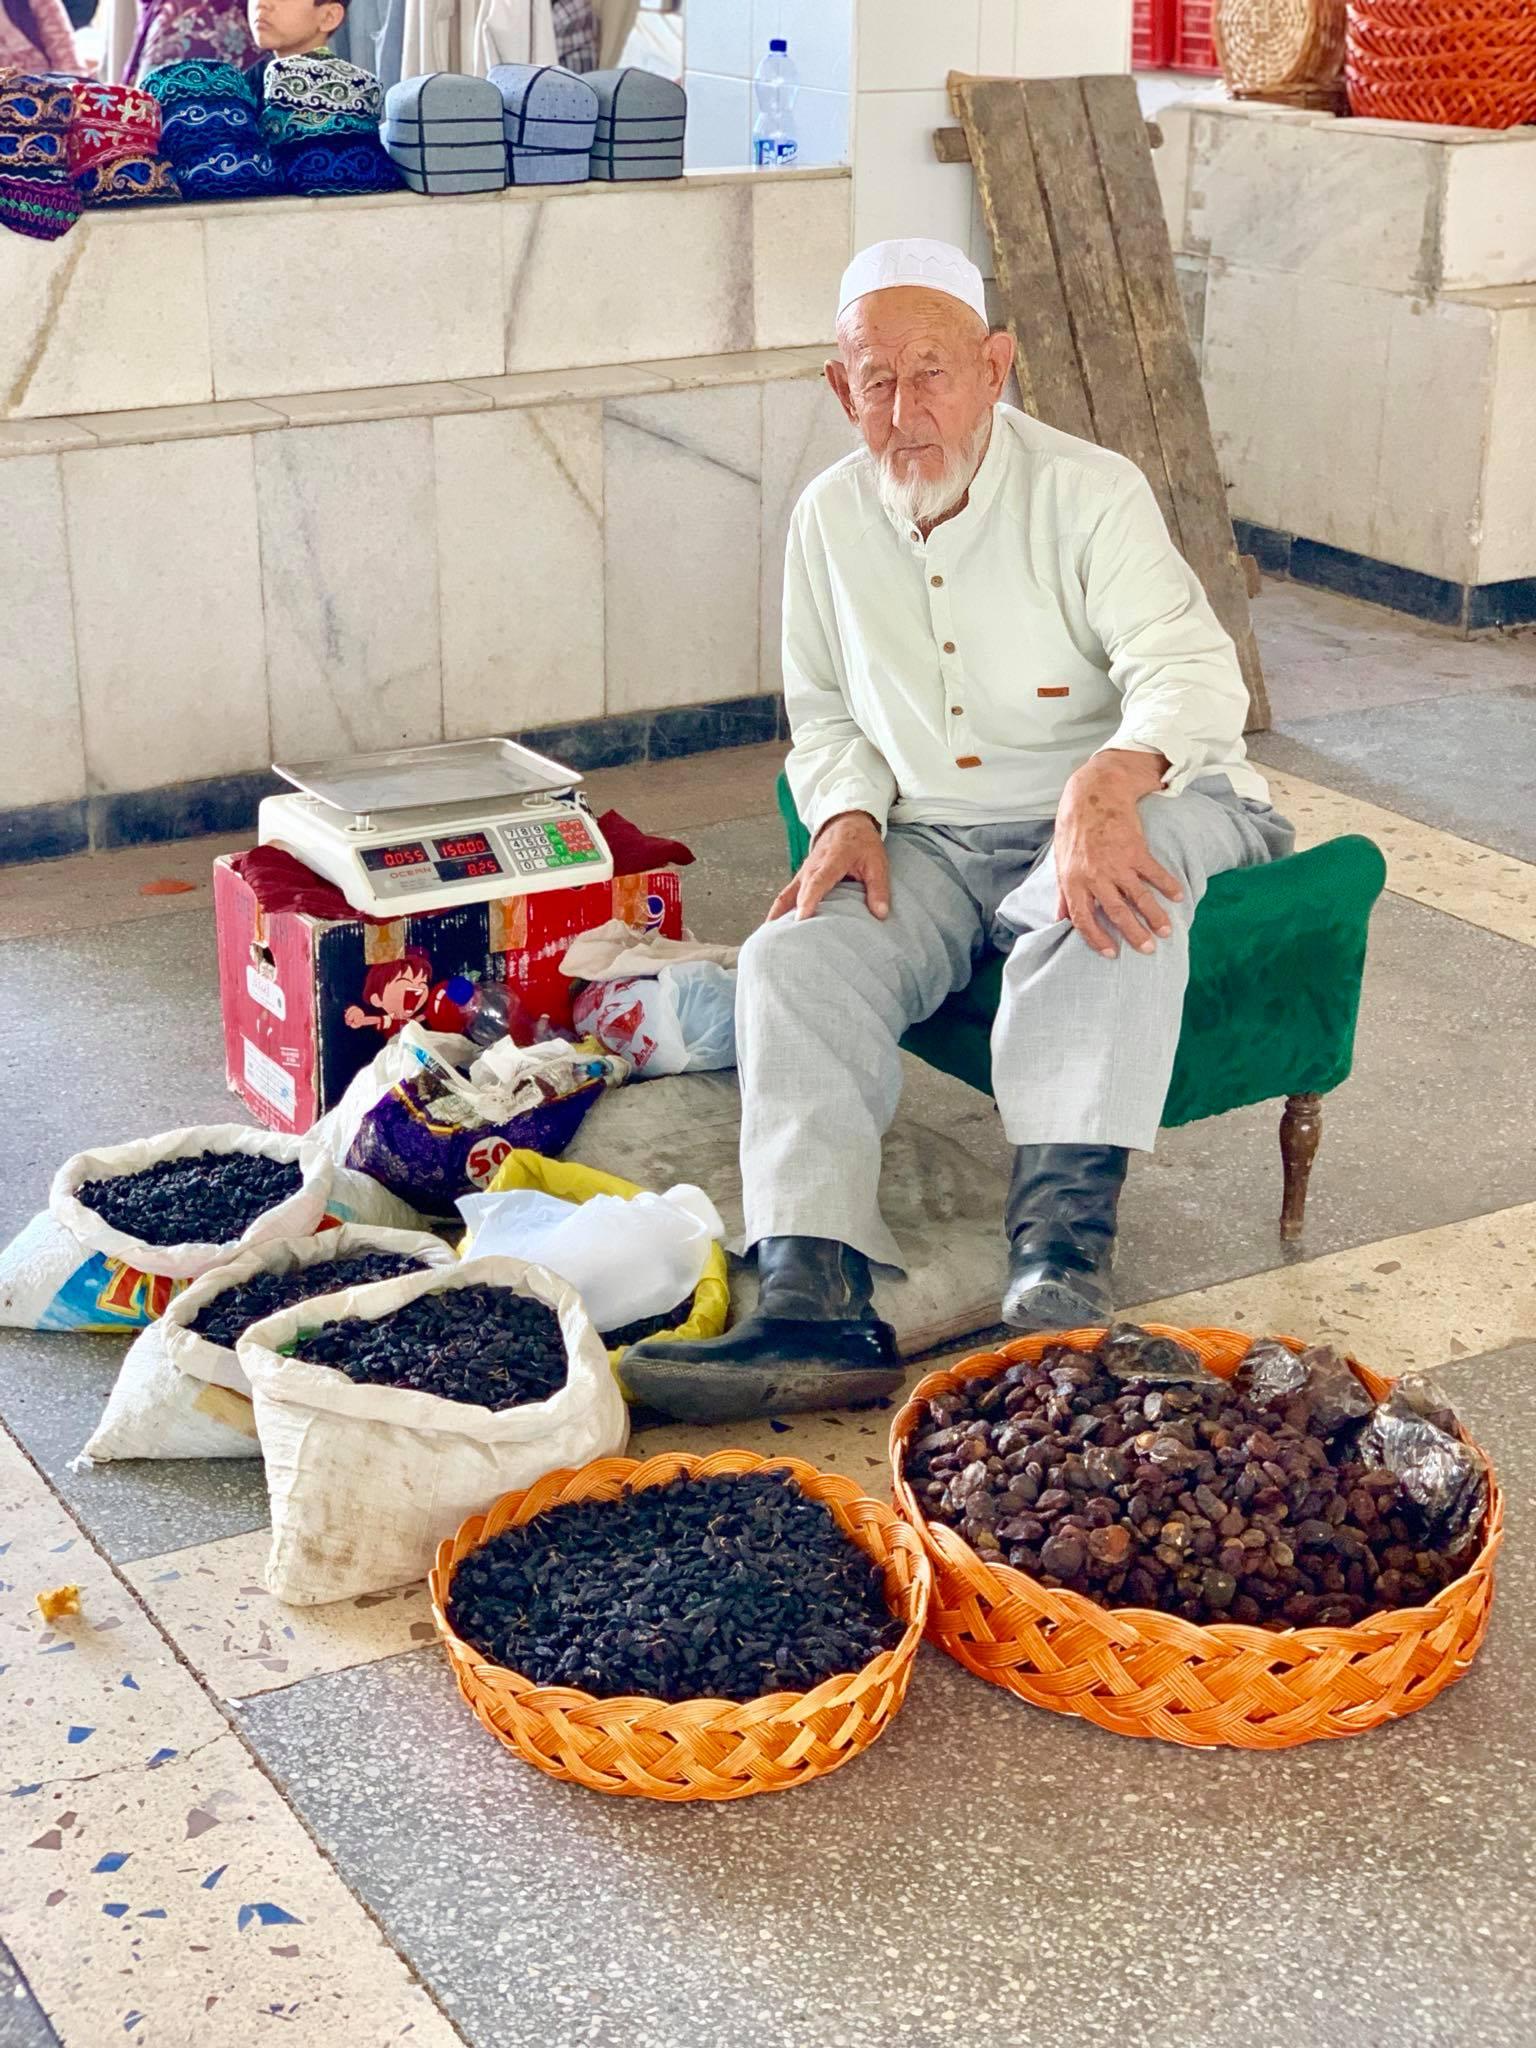 Kach Solo Travels in 2019 Siyab Bazaar and Registan on my first day in Samarkand25.jpg